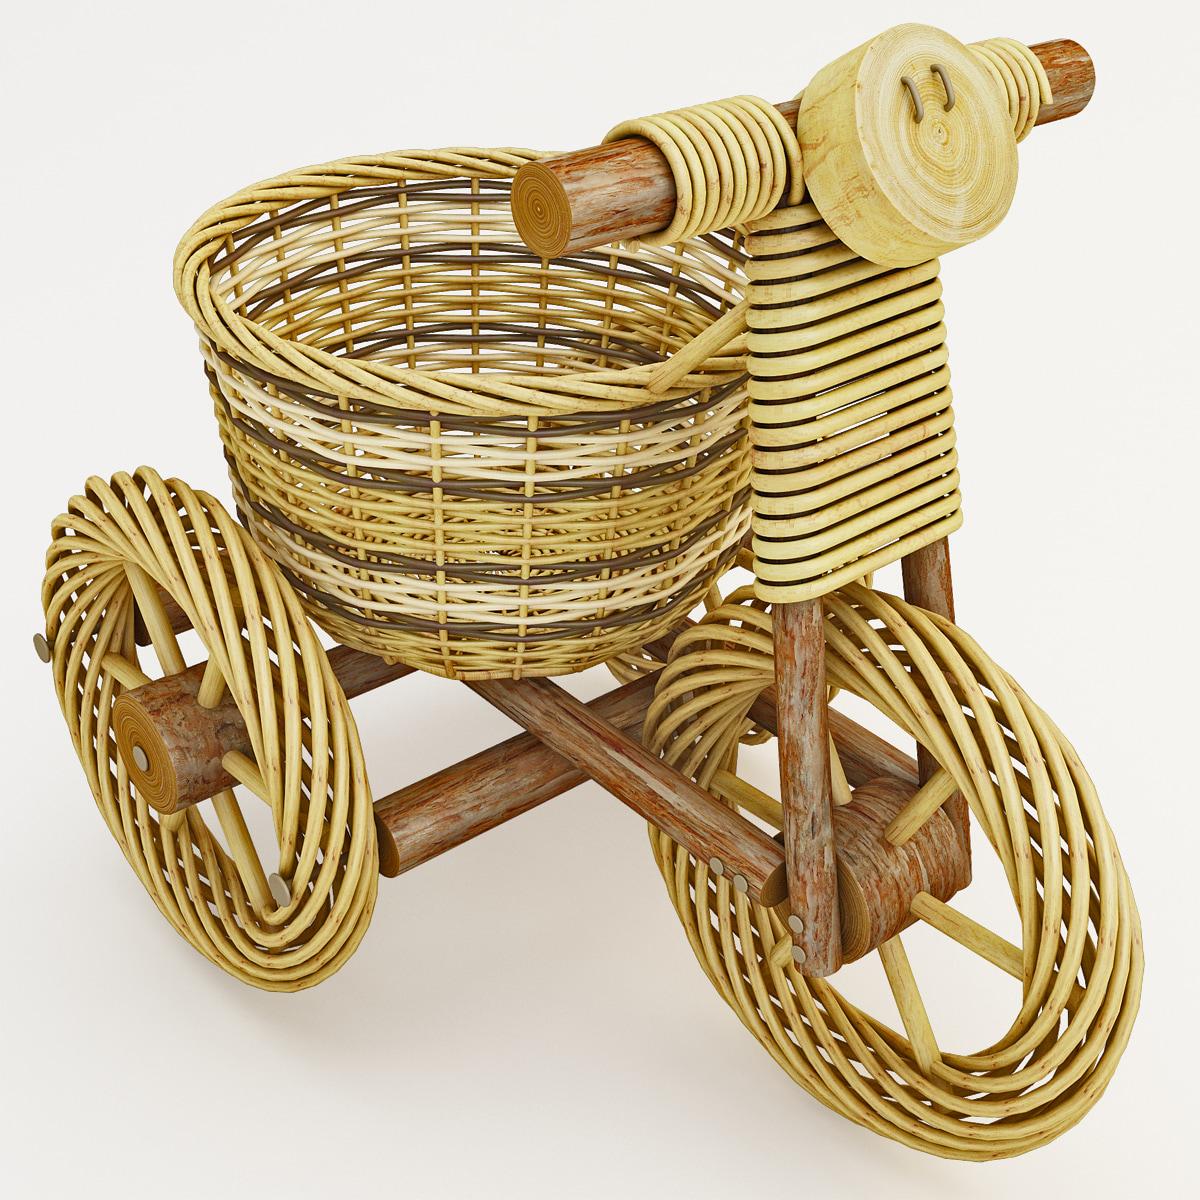 decorative cane baskets | My Web Value